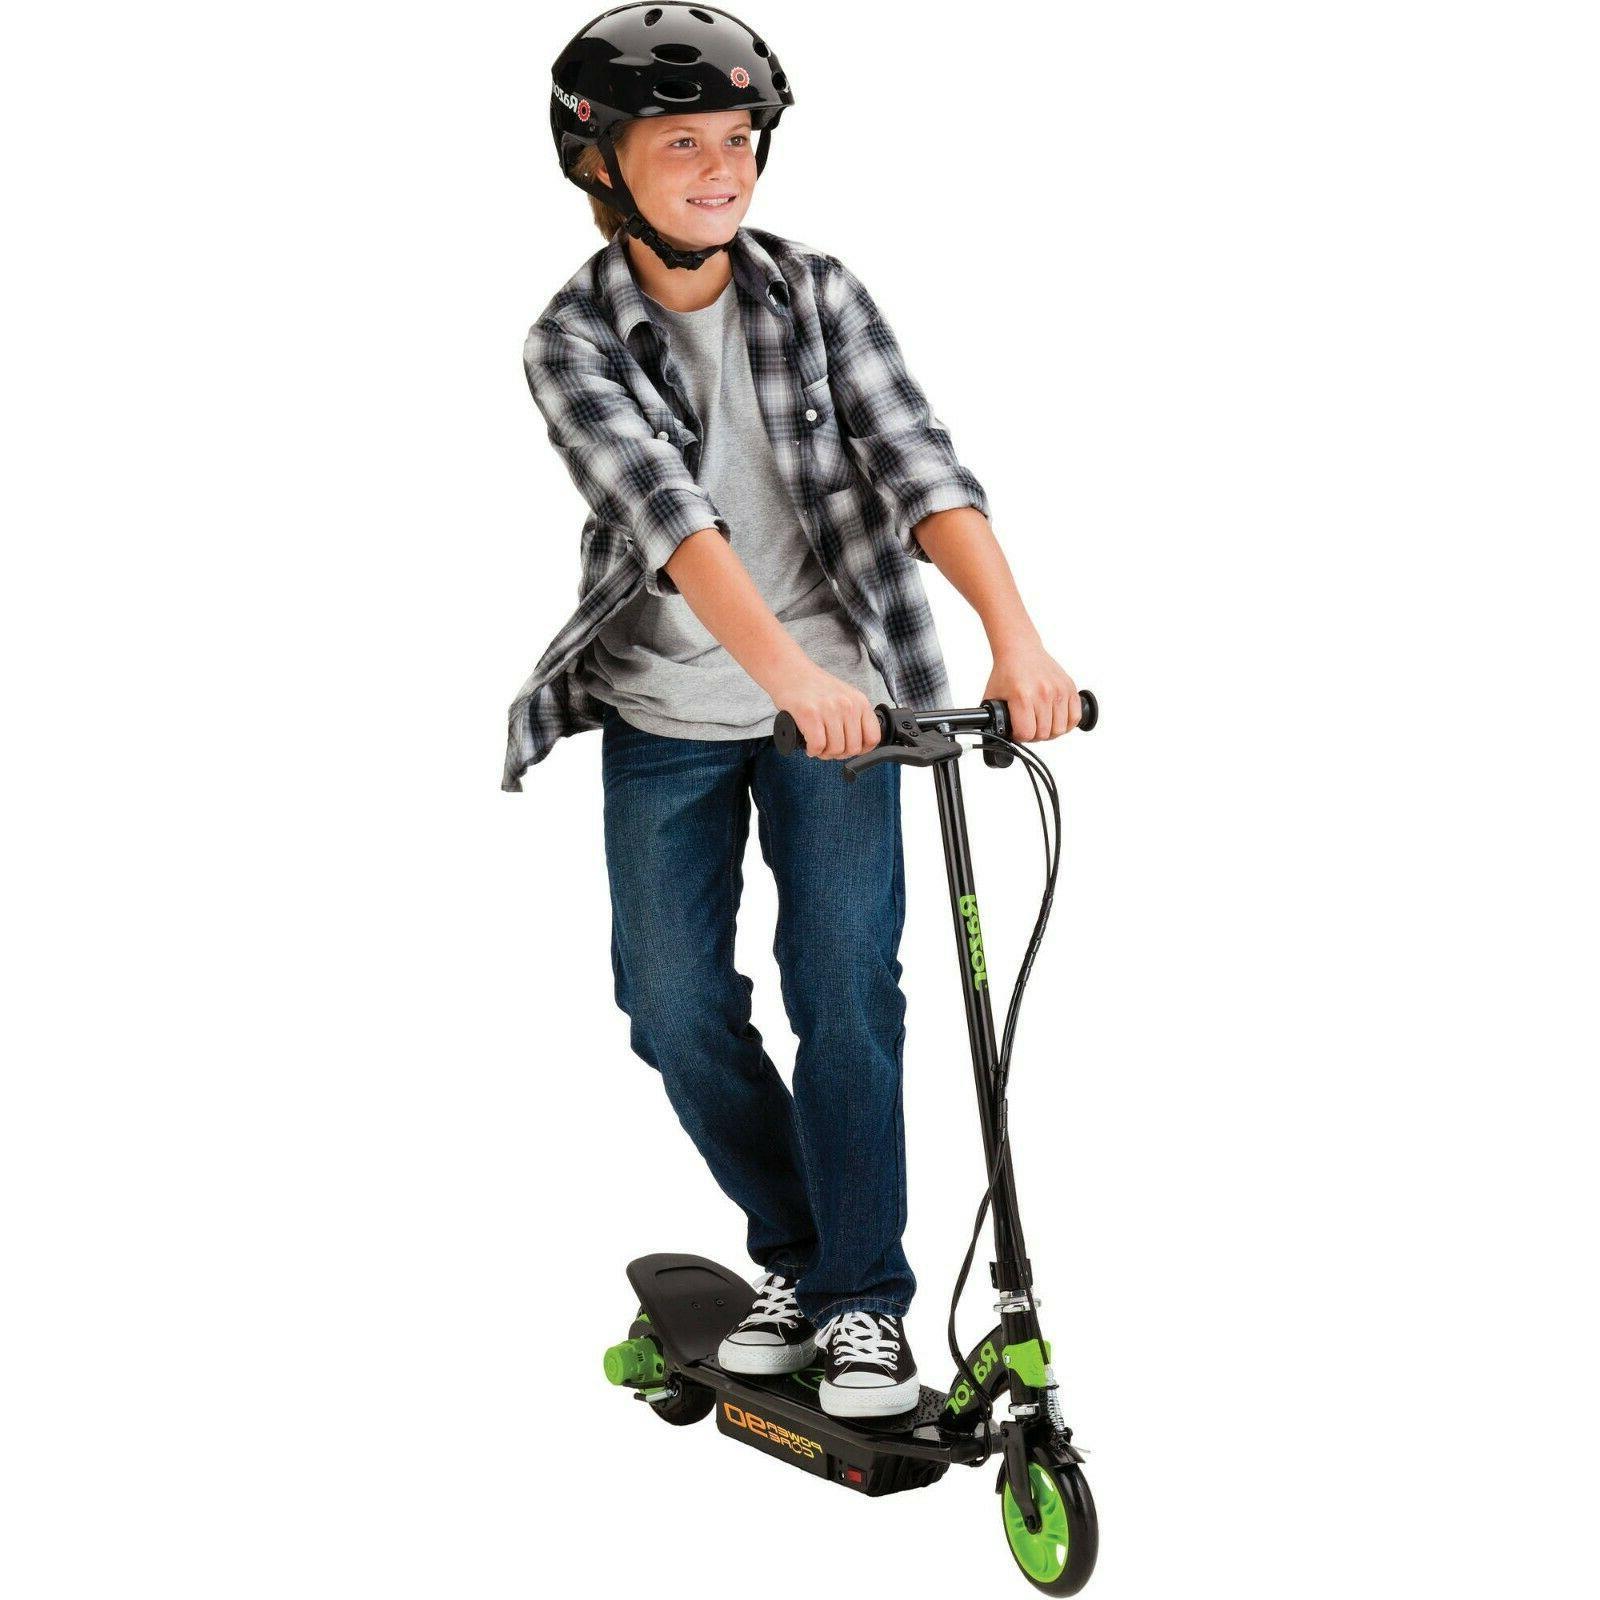 E95 Electric for Kids Ages 6-12 Motorized Ele Mi